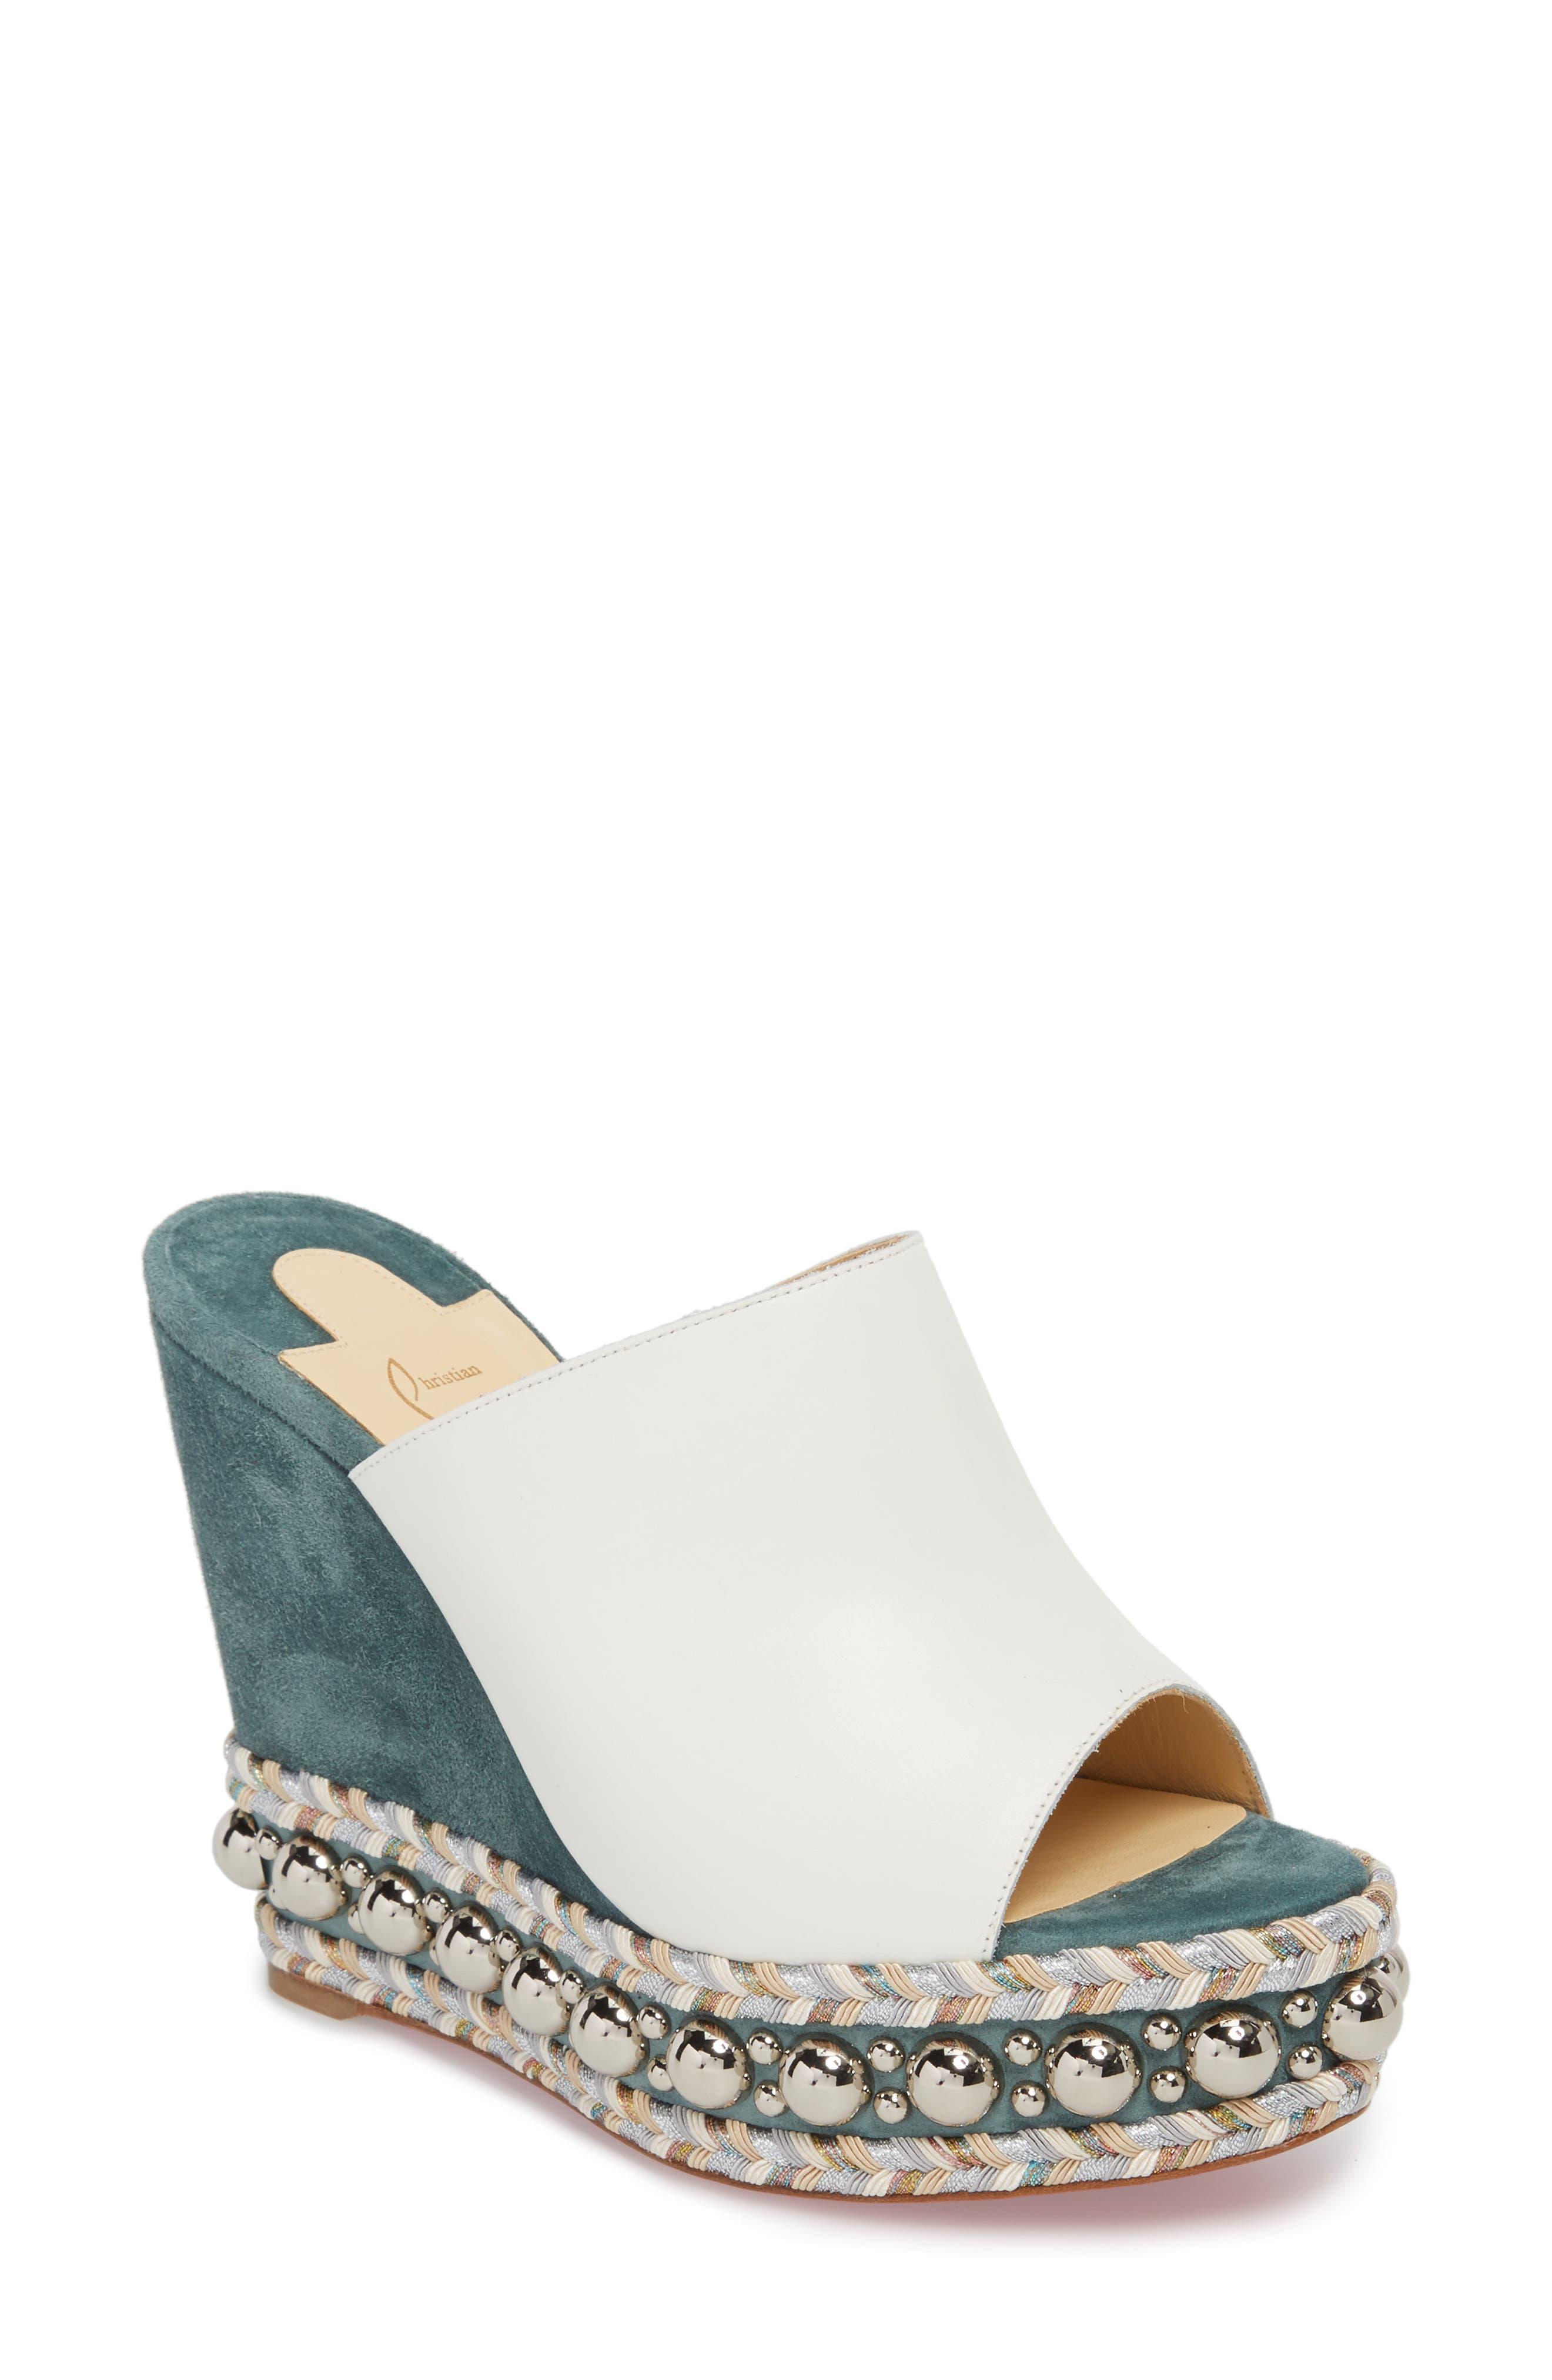 Christian Louboutin Janibasse Embellished Wedge Mule (Women)